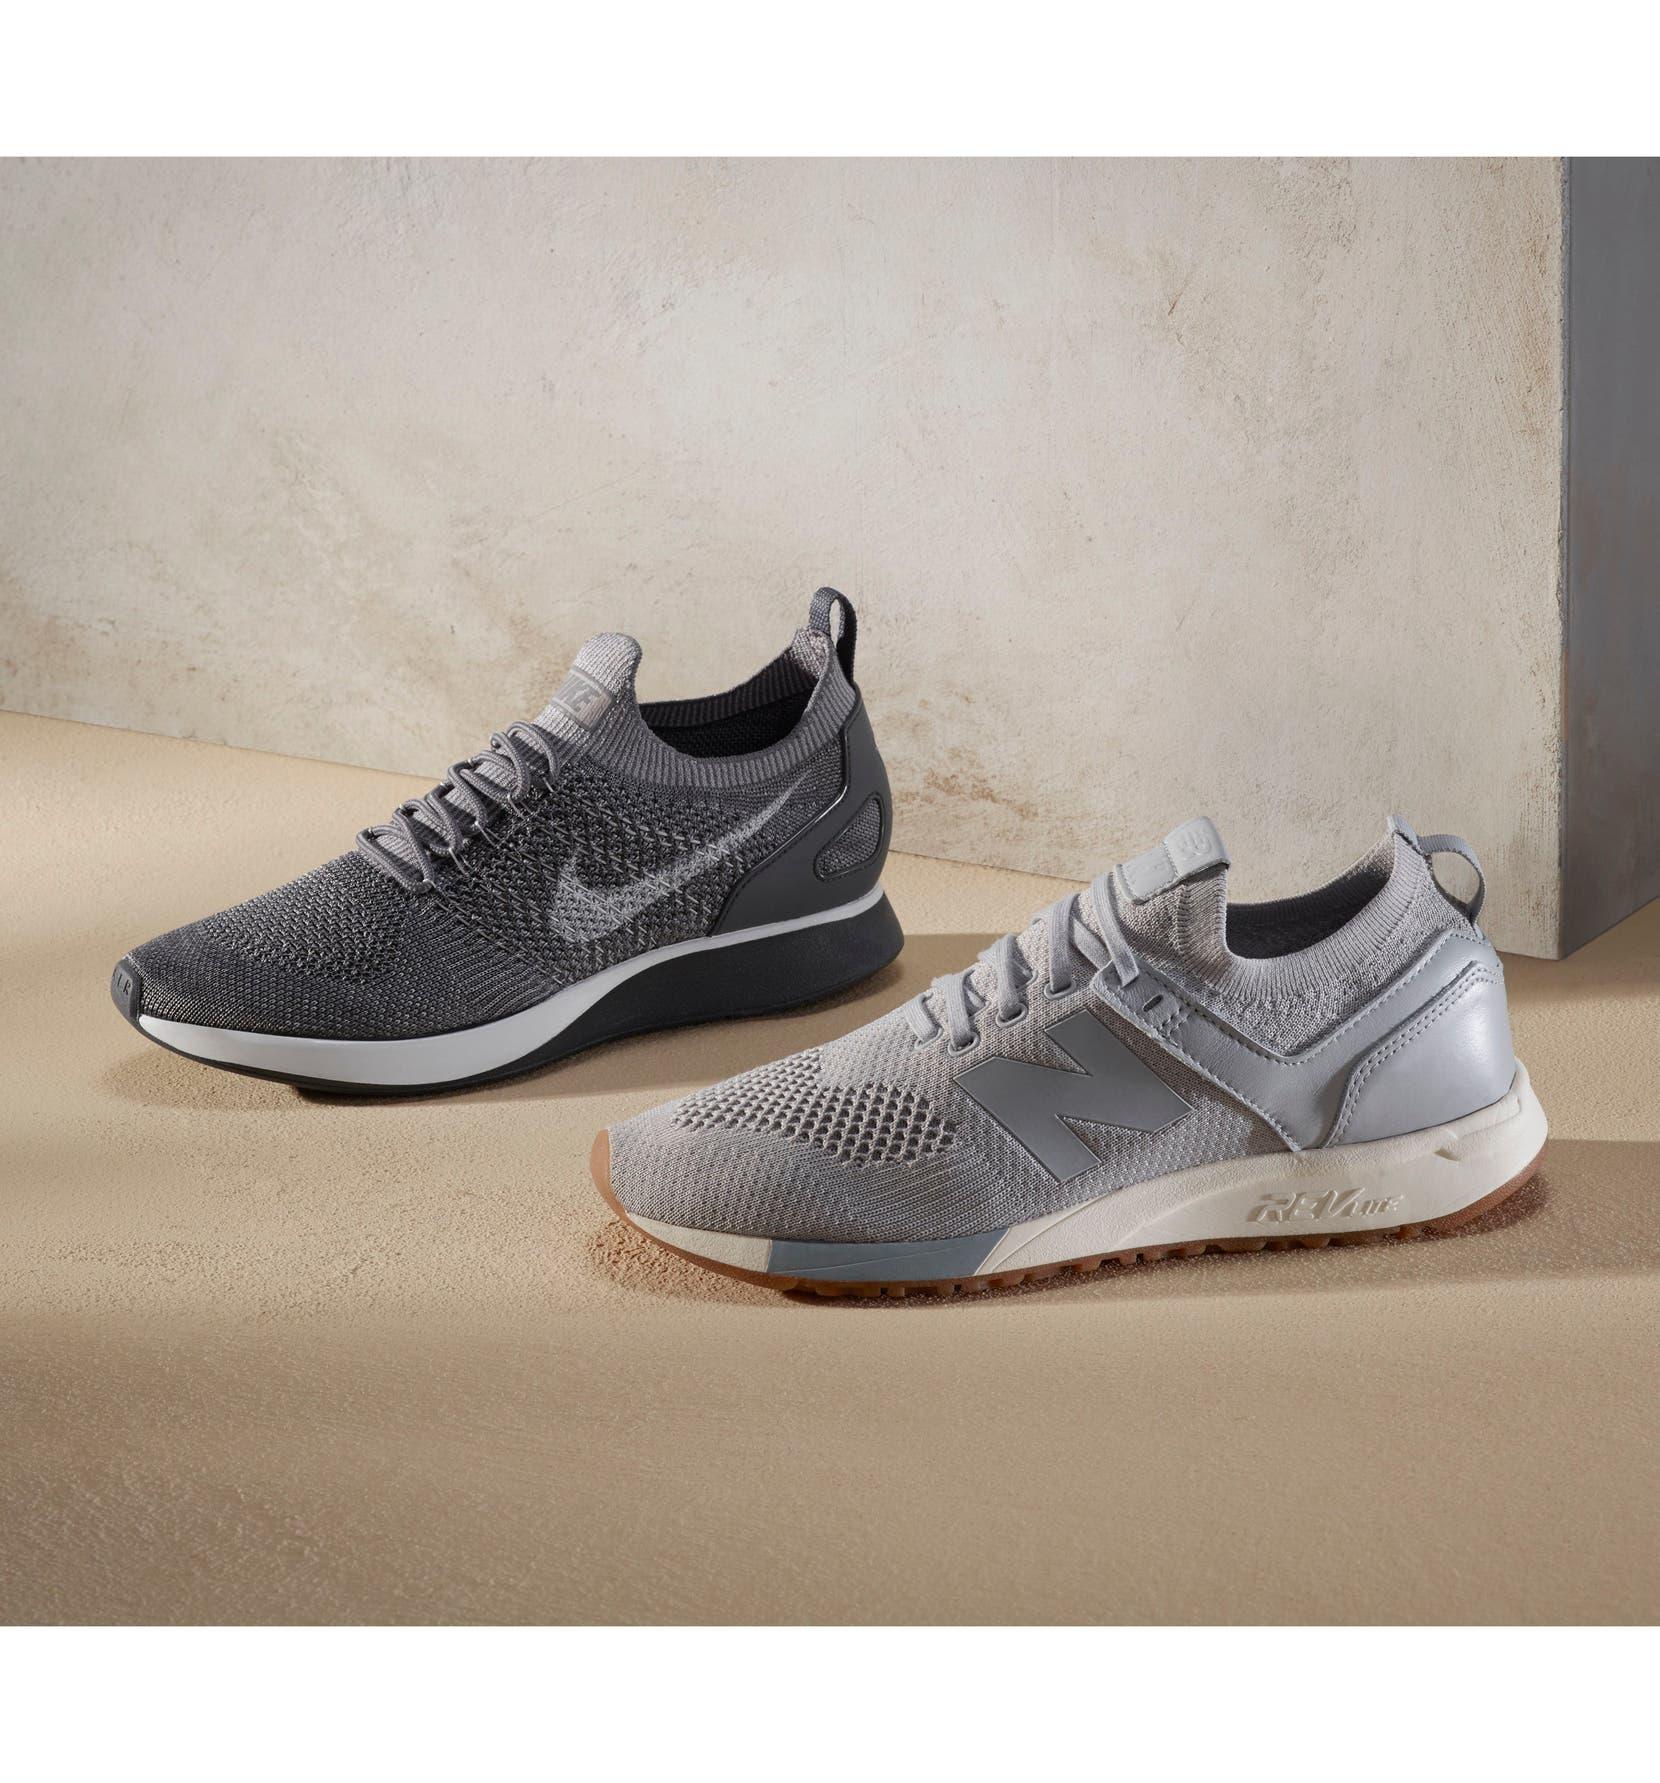 8d82c8c84706 Nike Air Zoom Mariah Flyknit Racer Sneaker (Men)